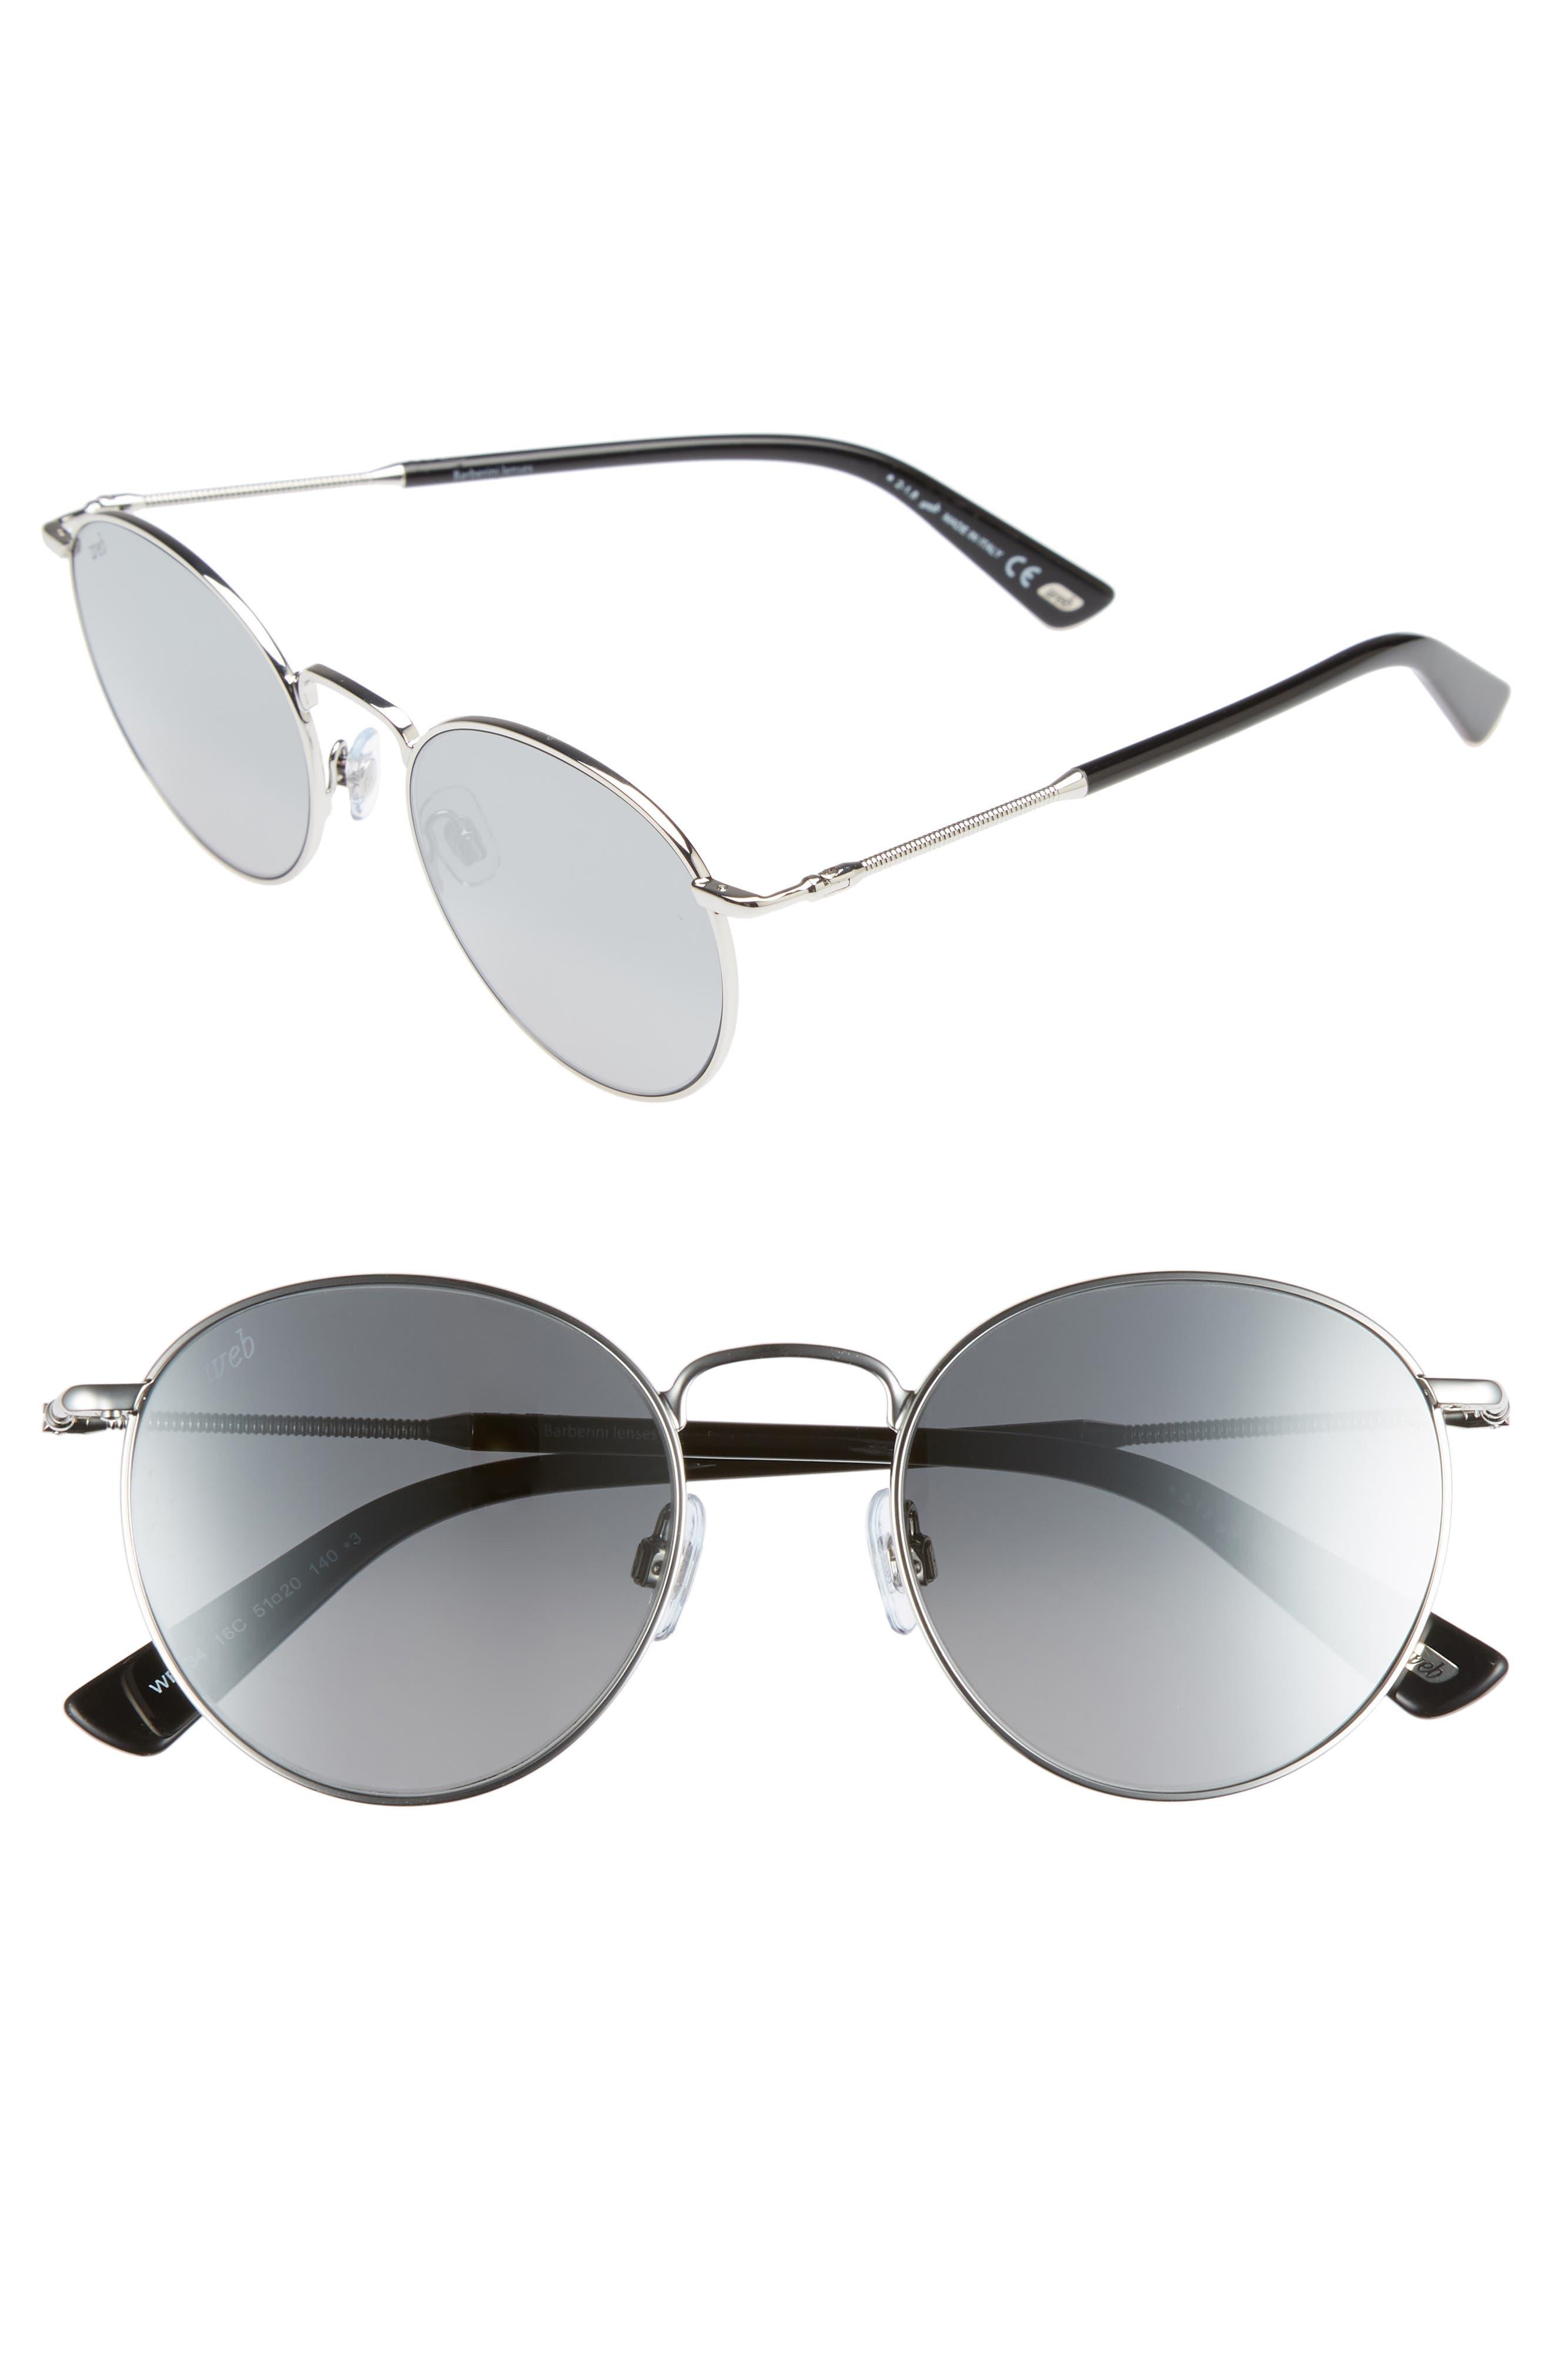 51mm Round Metal Sunglasses,                             Main thumbnail 1, color,                             Shiny Palladium/ Smoke Mirror